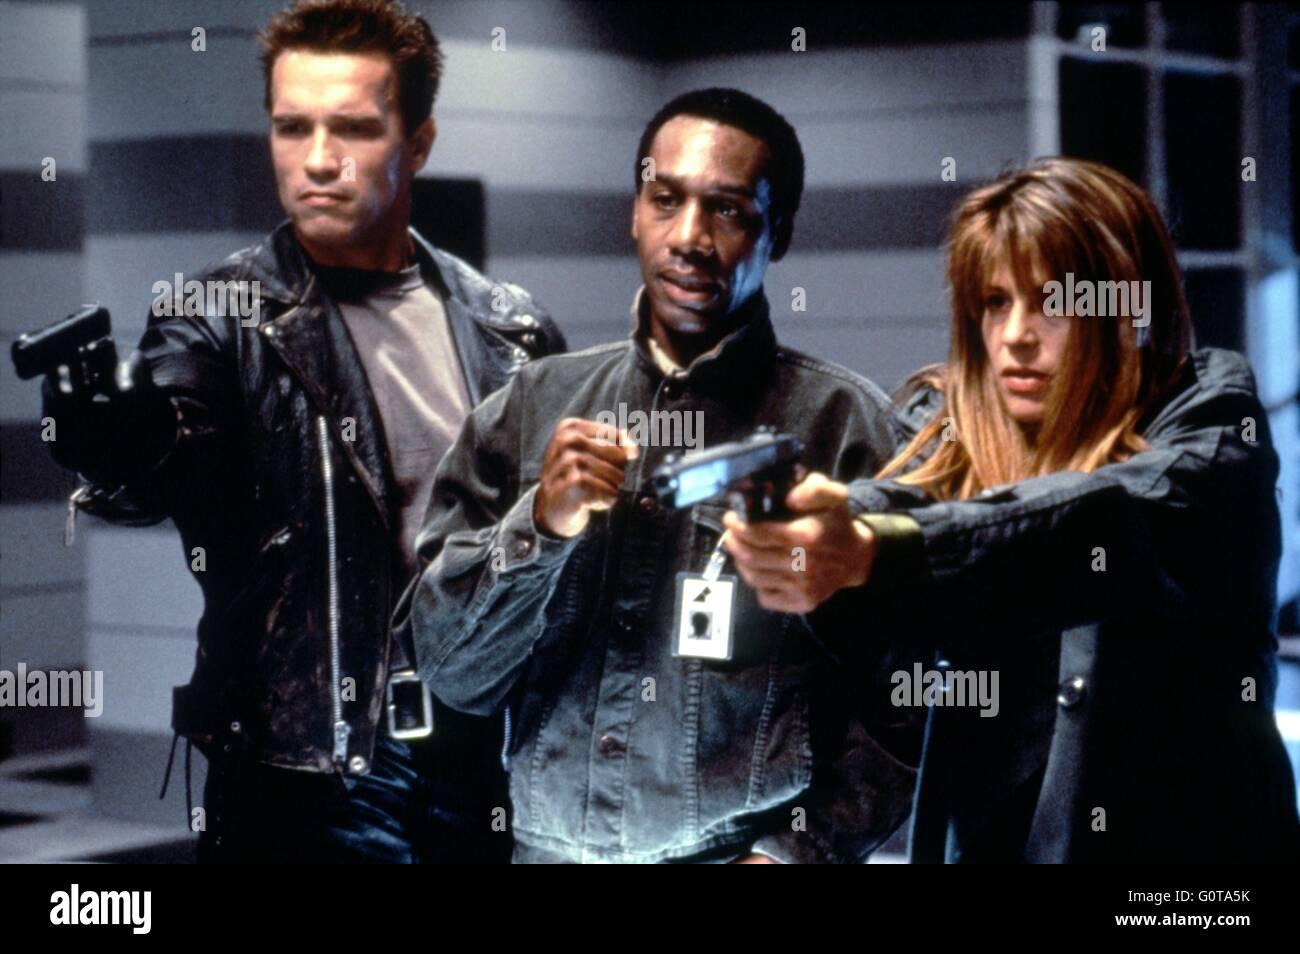 Arnold Schwarzenegger Joe Morton And Linda Hamilton Terminator 2 Stock Photo Alamy